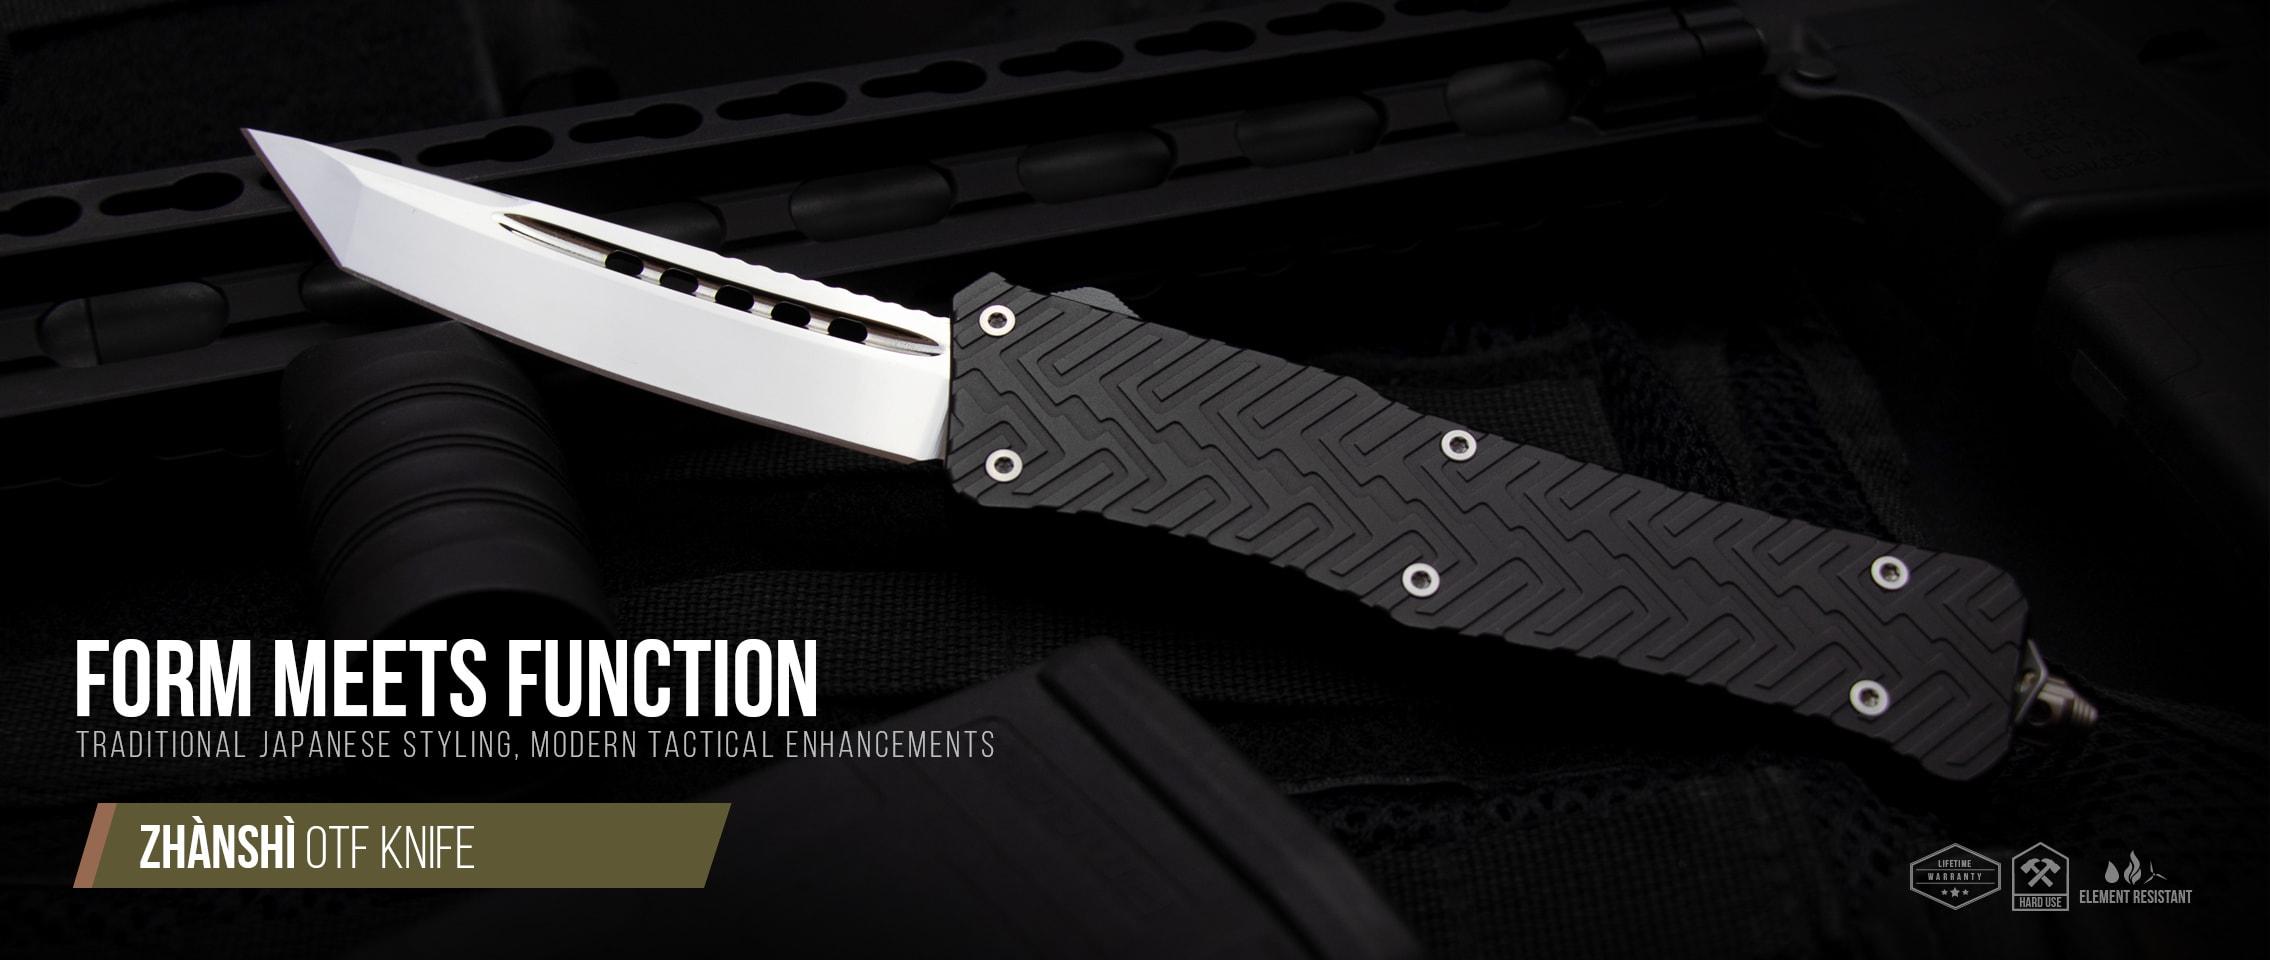 OTF Knife (Zhanshi) - RavenCrest Tactical